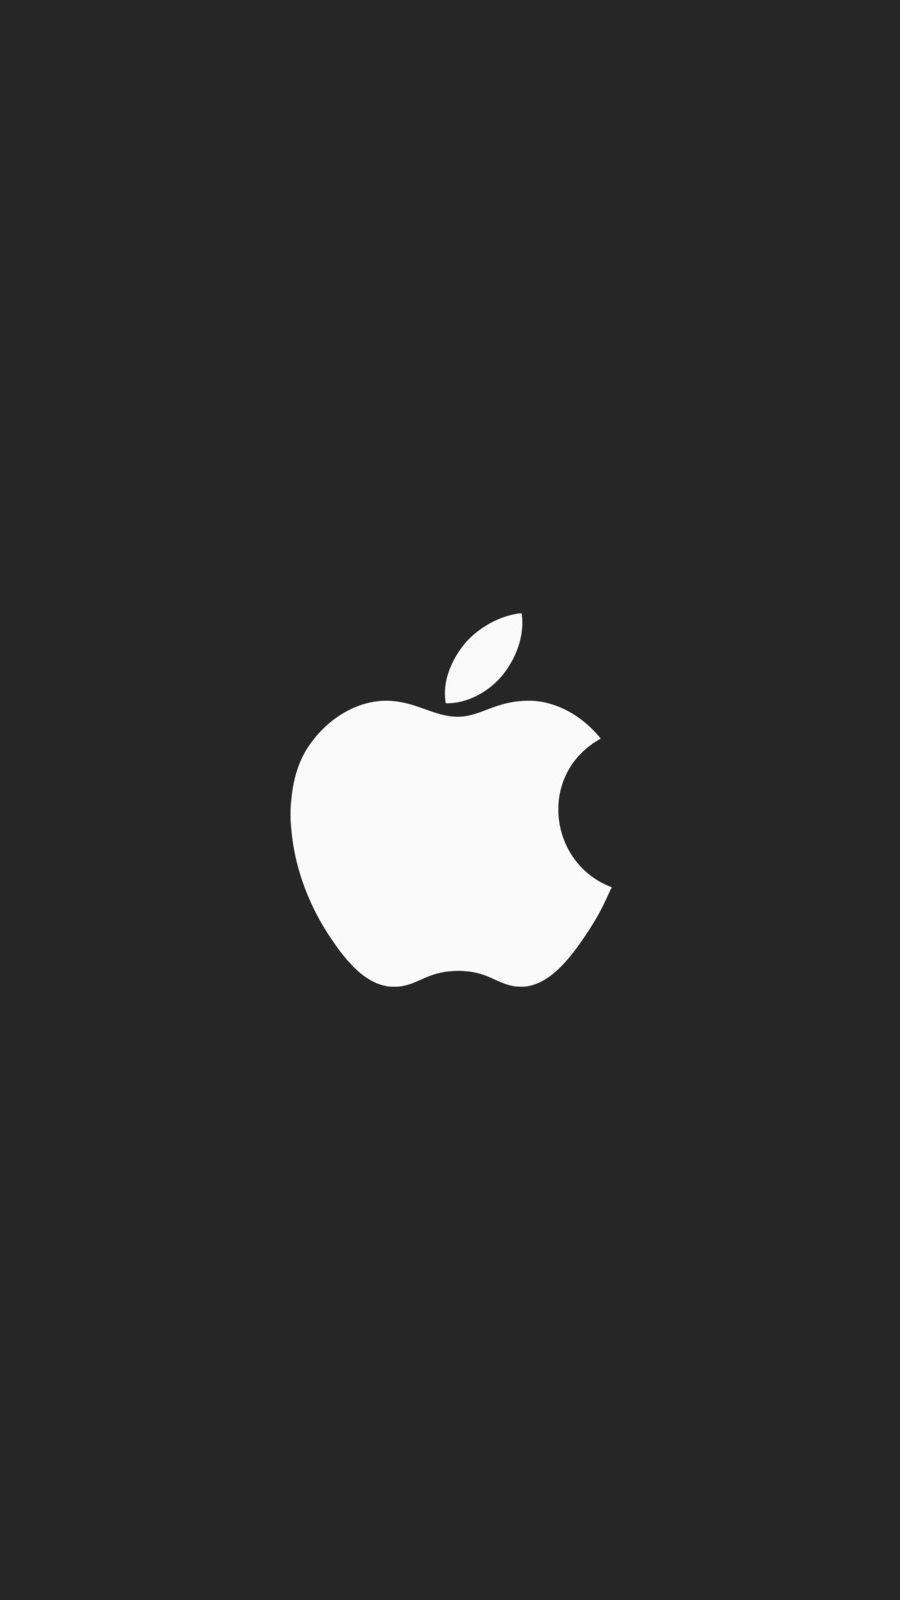 Ideas For Wallpaper Apple Logo Black Images In 2020